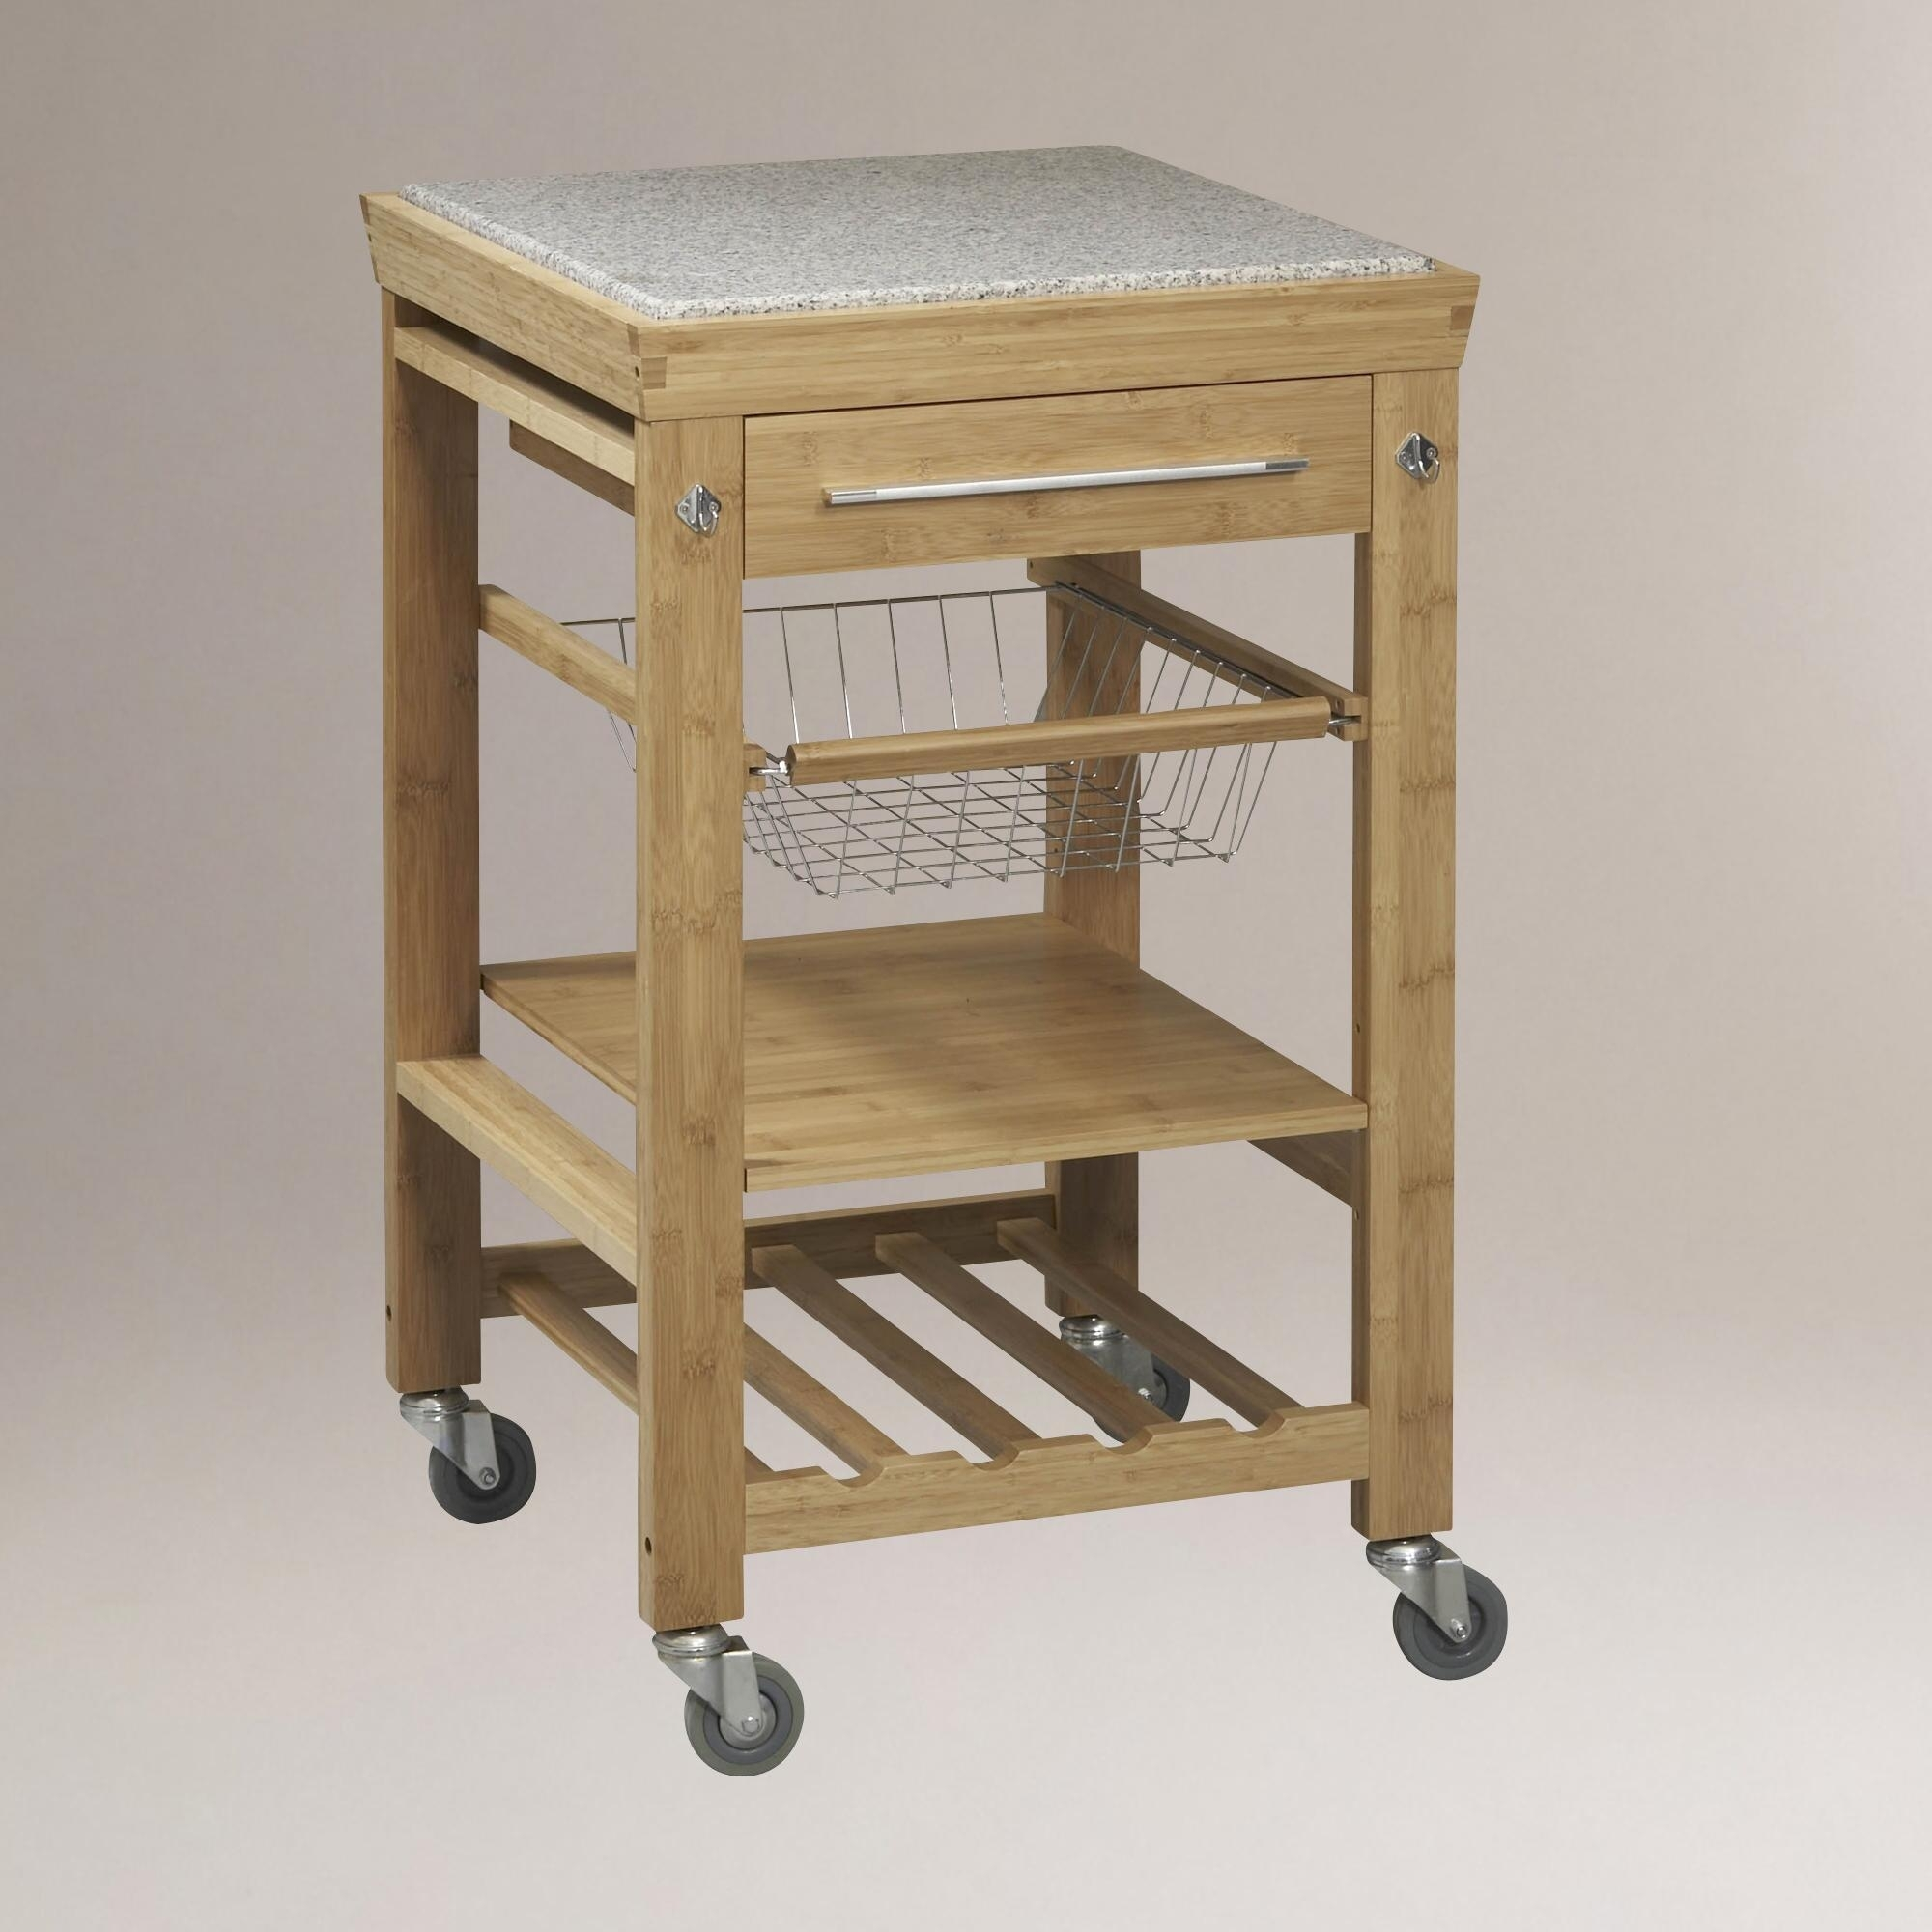 Madison Art Center Design: Build A Small Rolling Work Cart